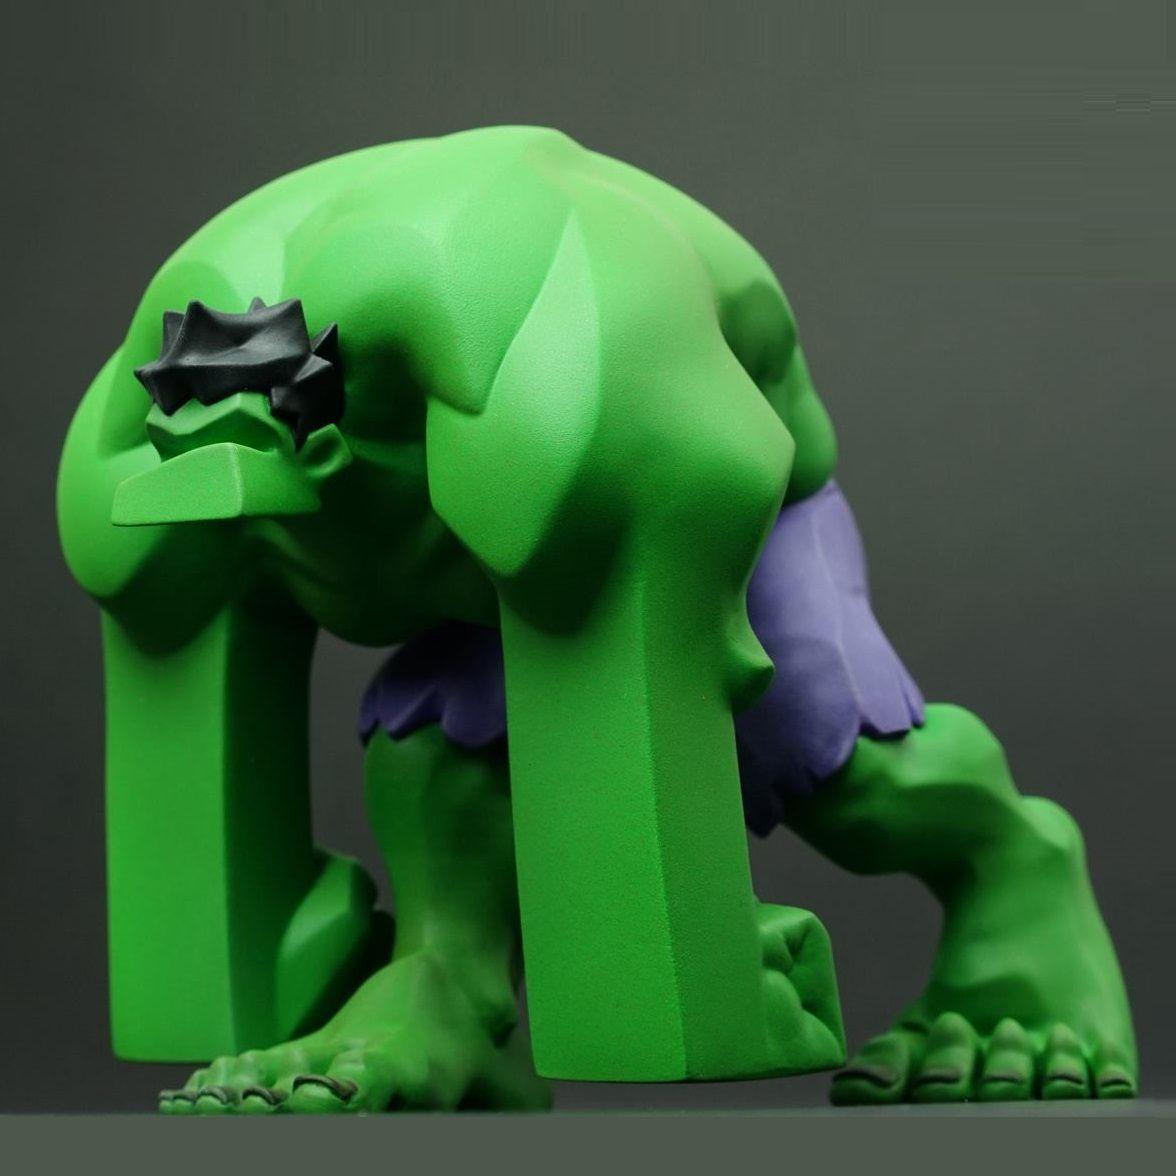 Sneak peek of Devil Planet Green Hulk (artwork by Kang Minjung